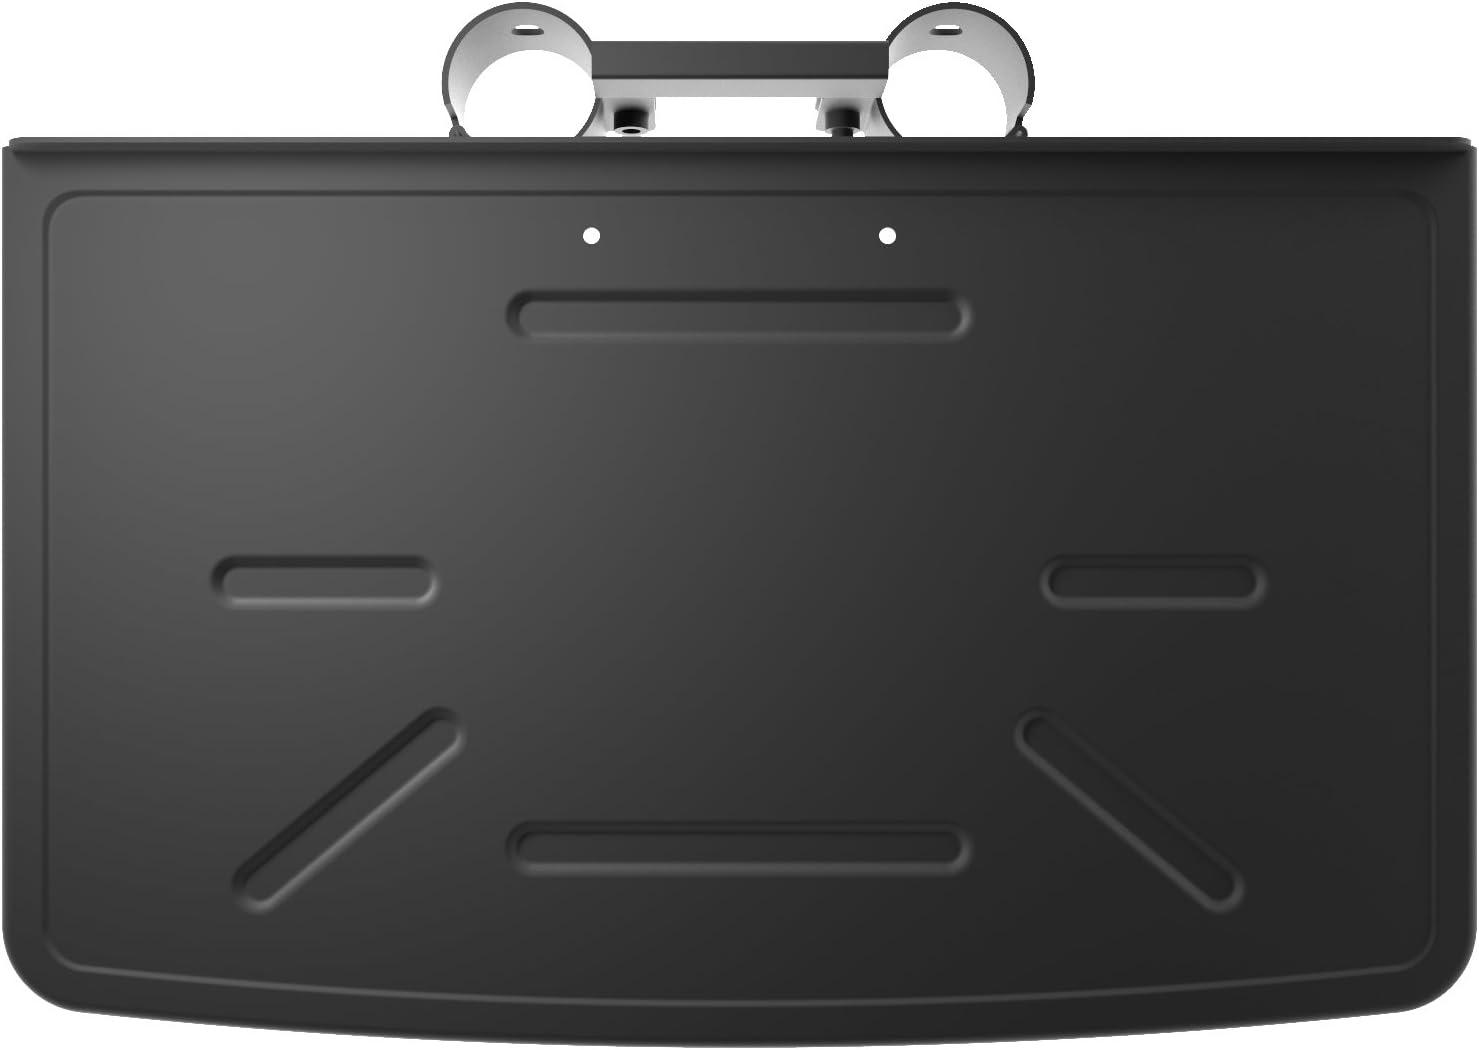 Kanto MTM-Tray Mobile TV Cart Accessory Tray